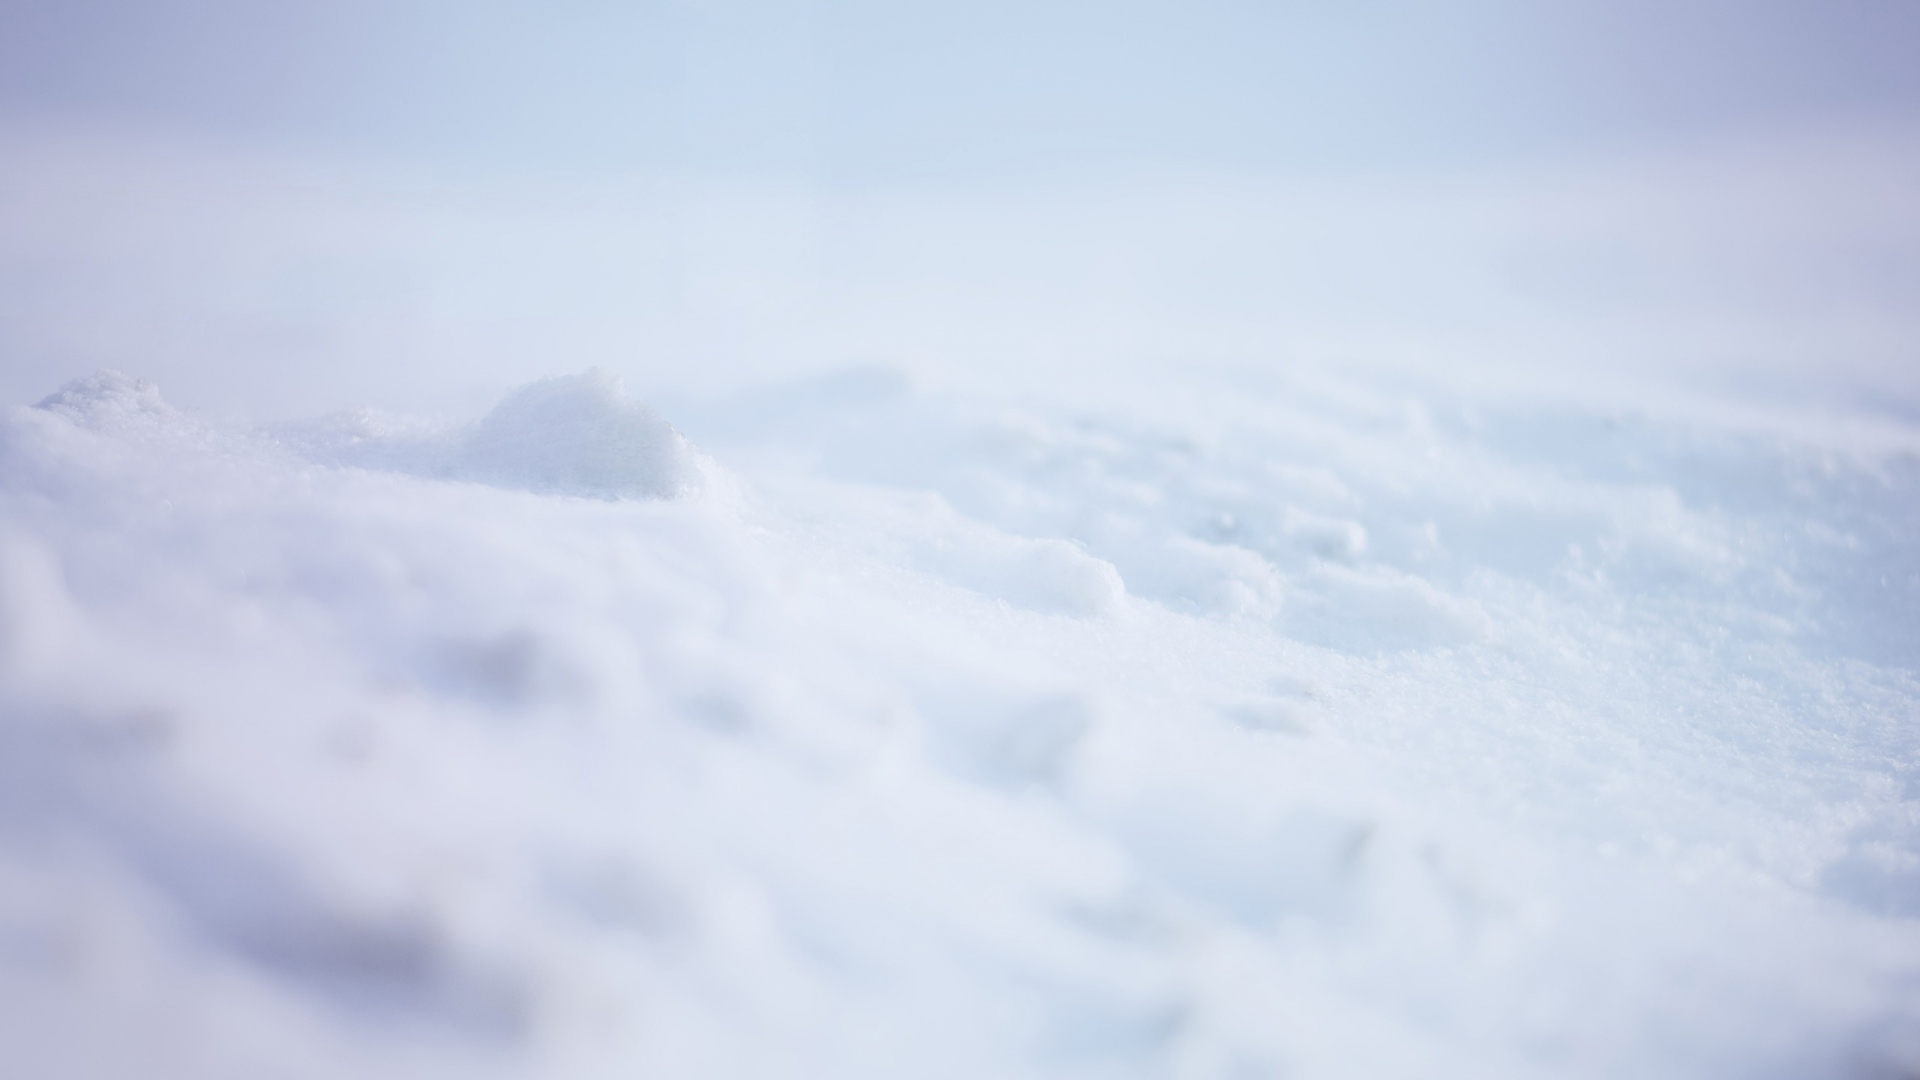 download wallpaper 1920x1080 snow white background